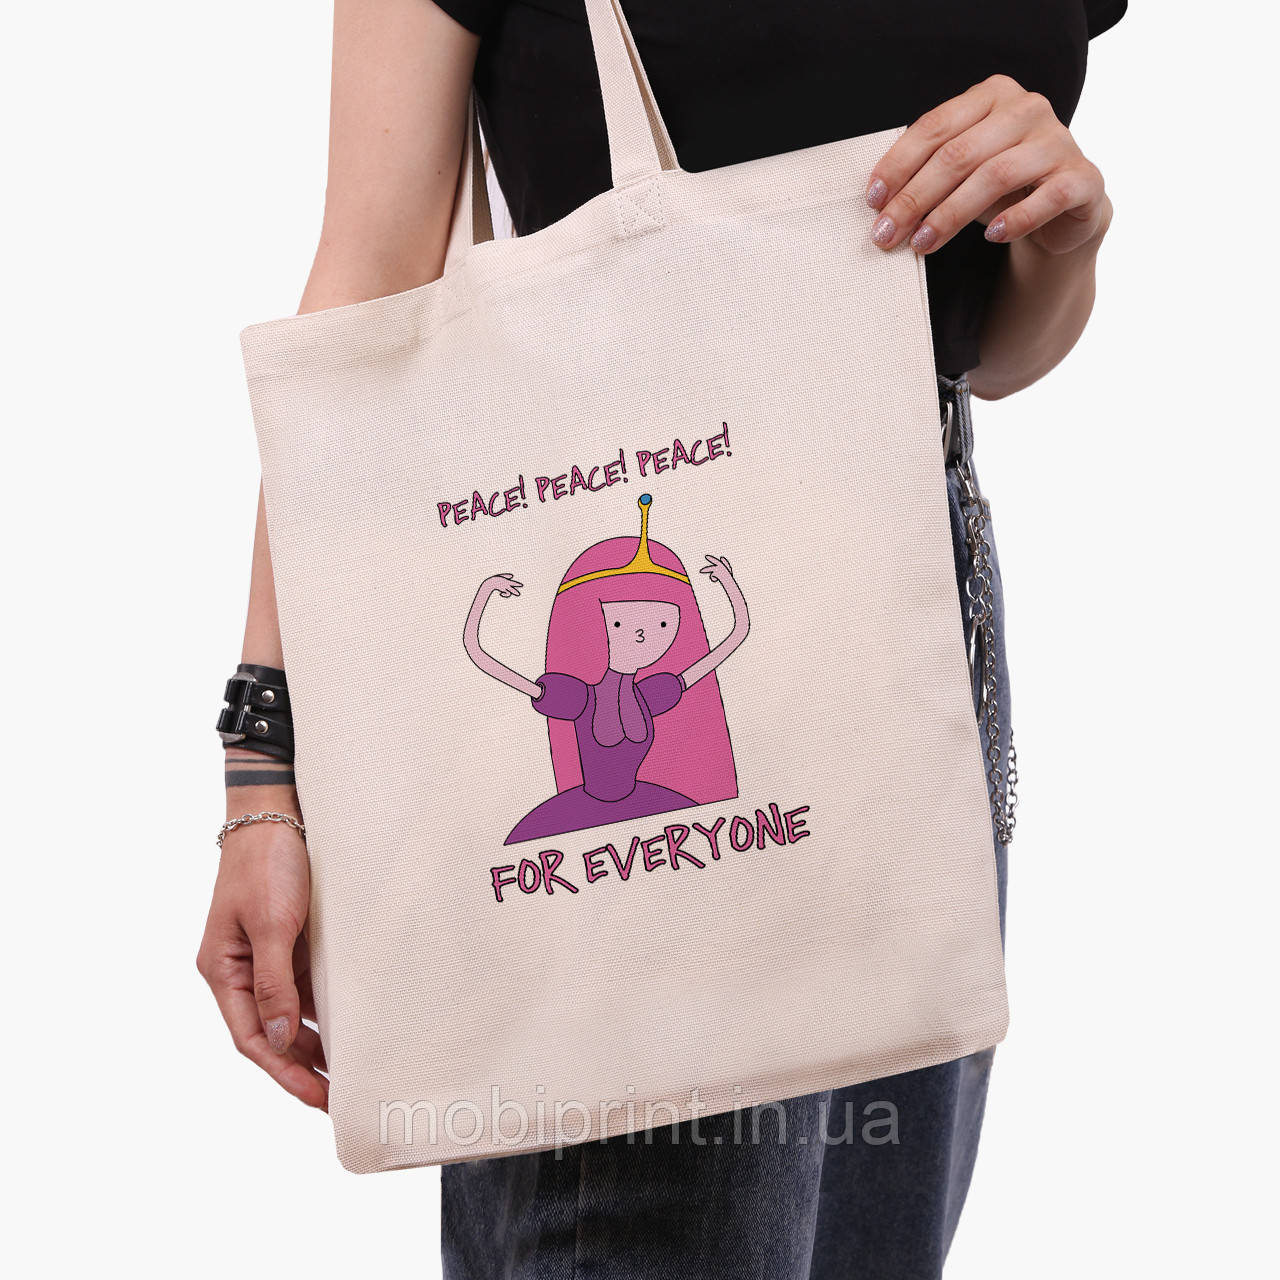 Еко сумка шоппер з принтом Принцеса бубльгум (Adventure Time) (9227-1576)